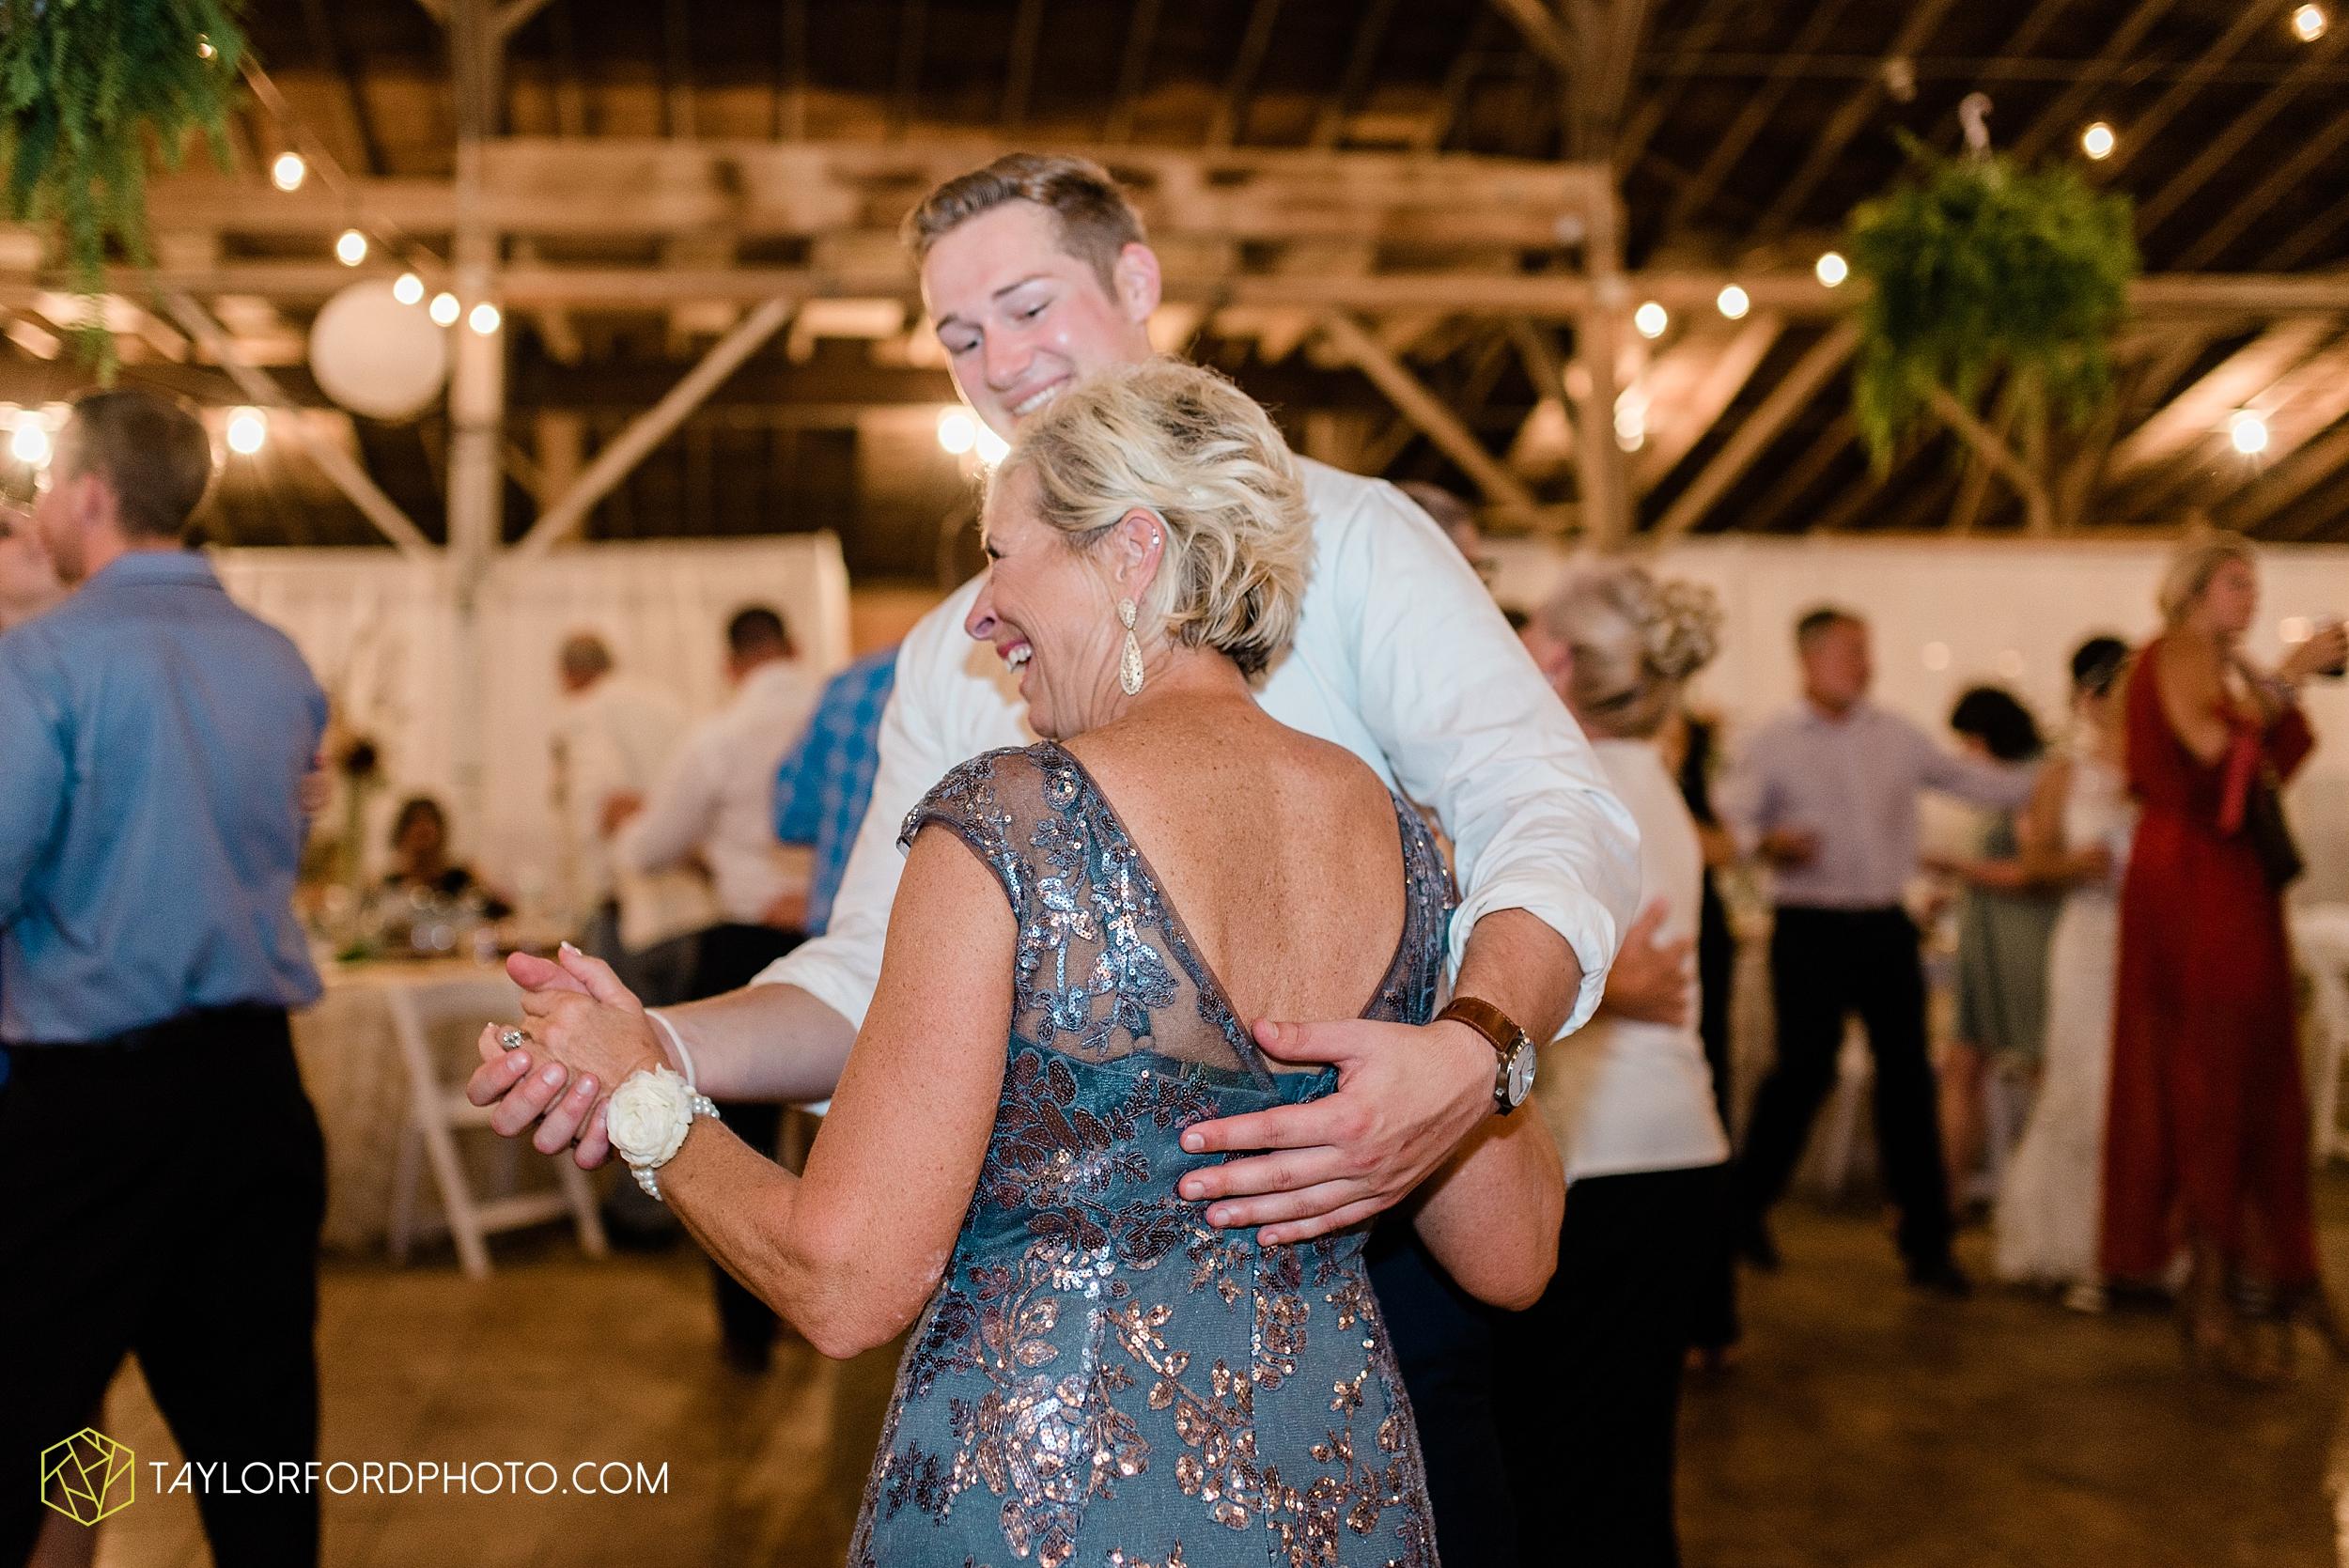 van-wert-ohio-first-united-methodist-church-county-dairy-barn-wedding-photographer-taylor-ford-photography_9882.jpg